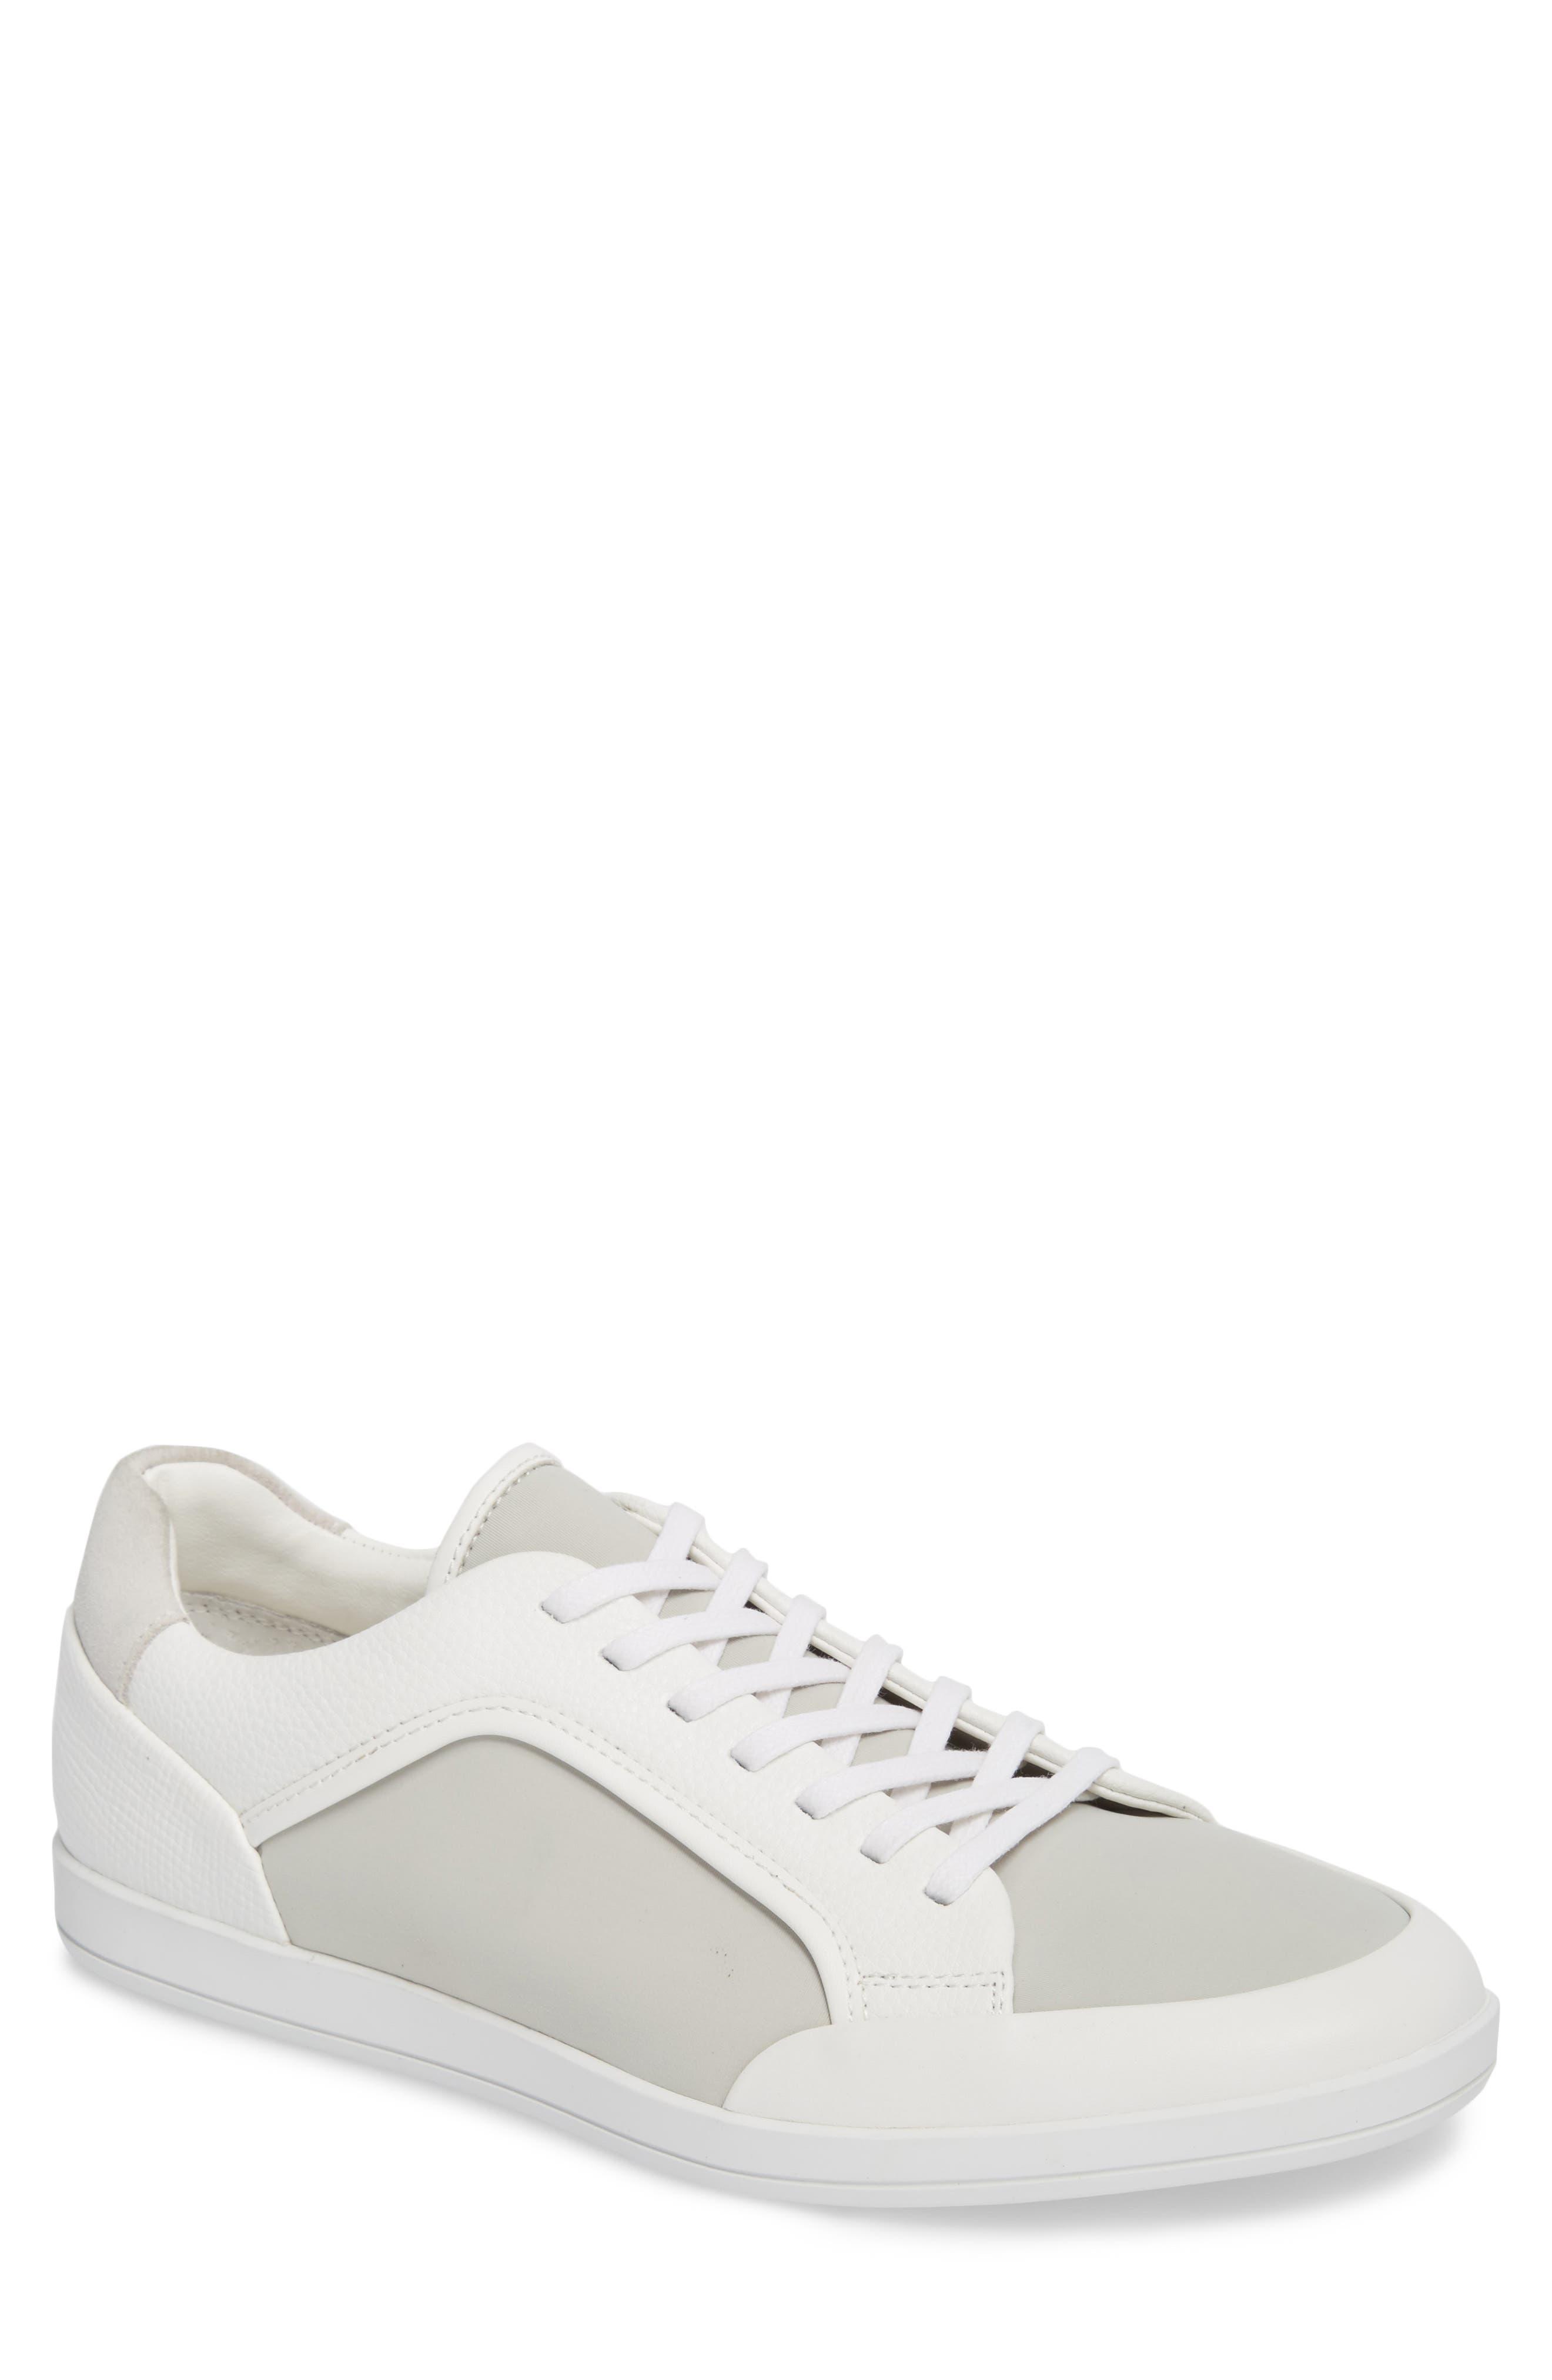 Masen Sneaker,                             Main thumbnail 3, color,